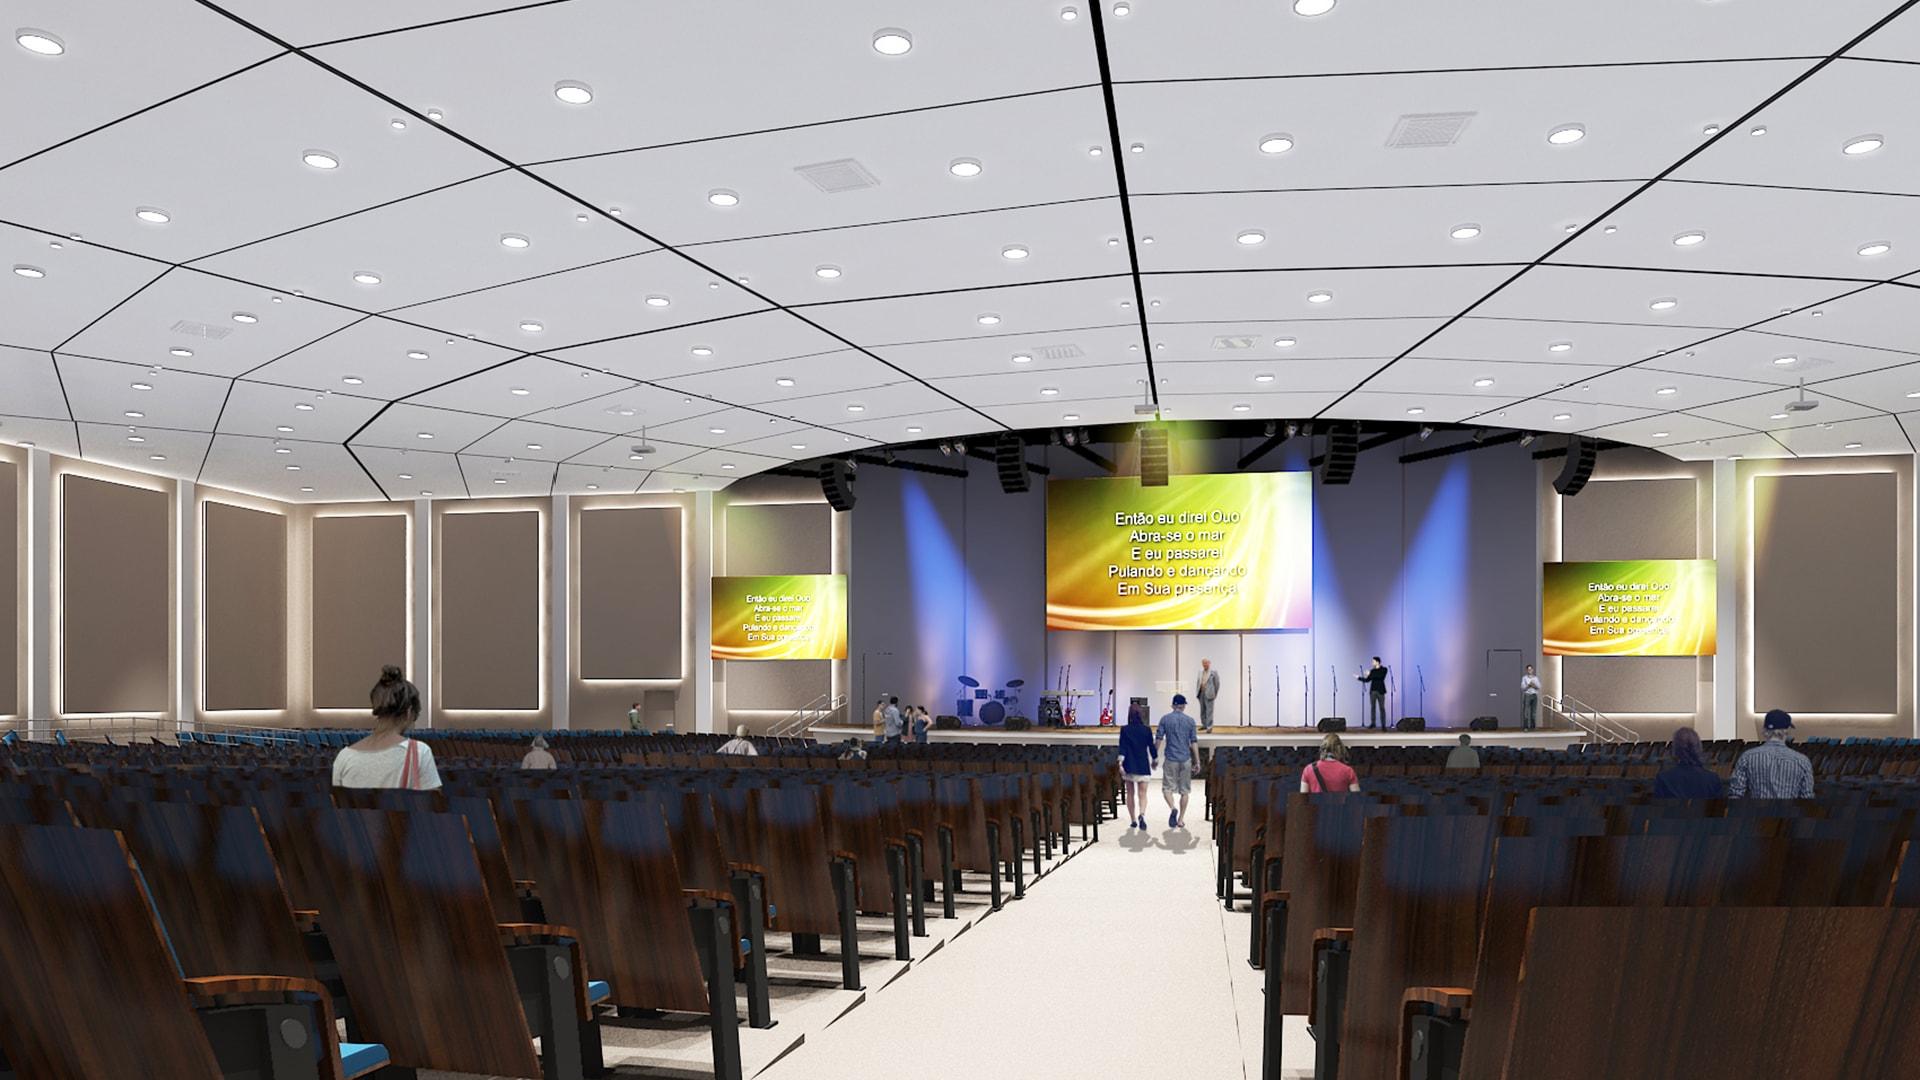 Institucional - Igreja da Paz - Roraima - RO